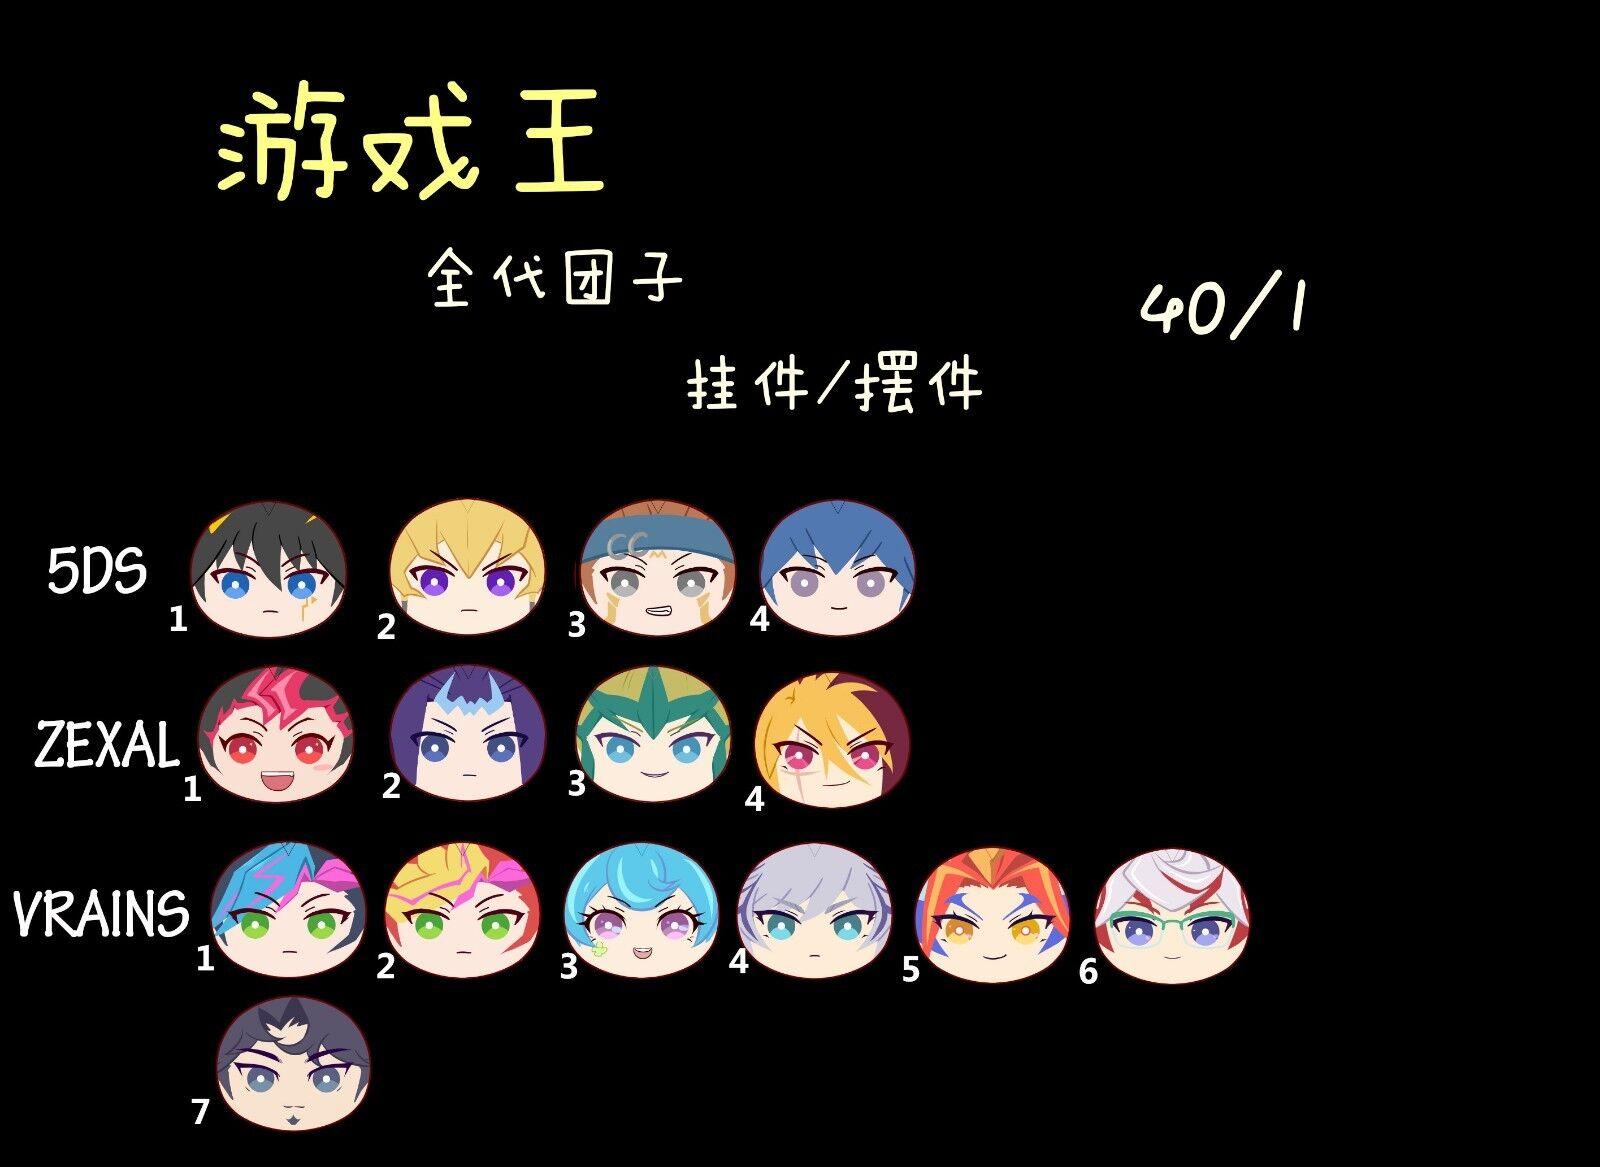 YGO YuGioh 5DS ZEXAL VRAINS Yusei Fudo Muto Playmaker Plush Doll Keychain Strap